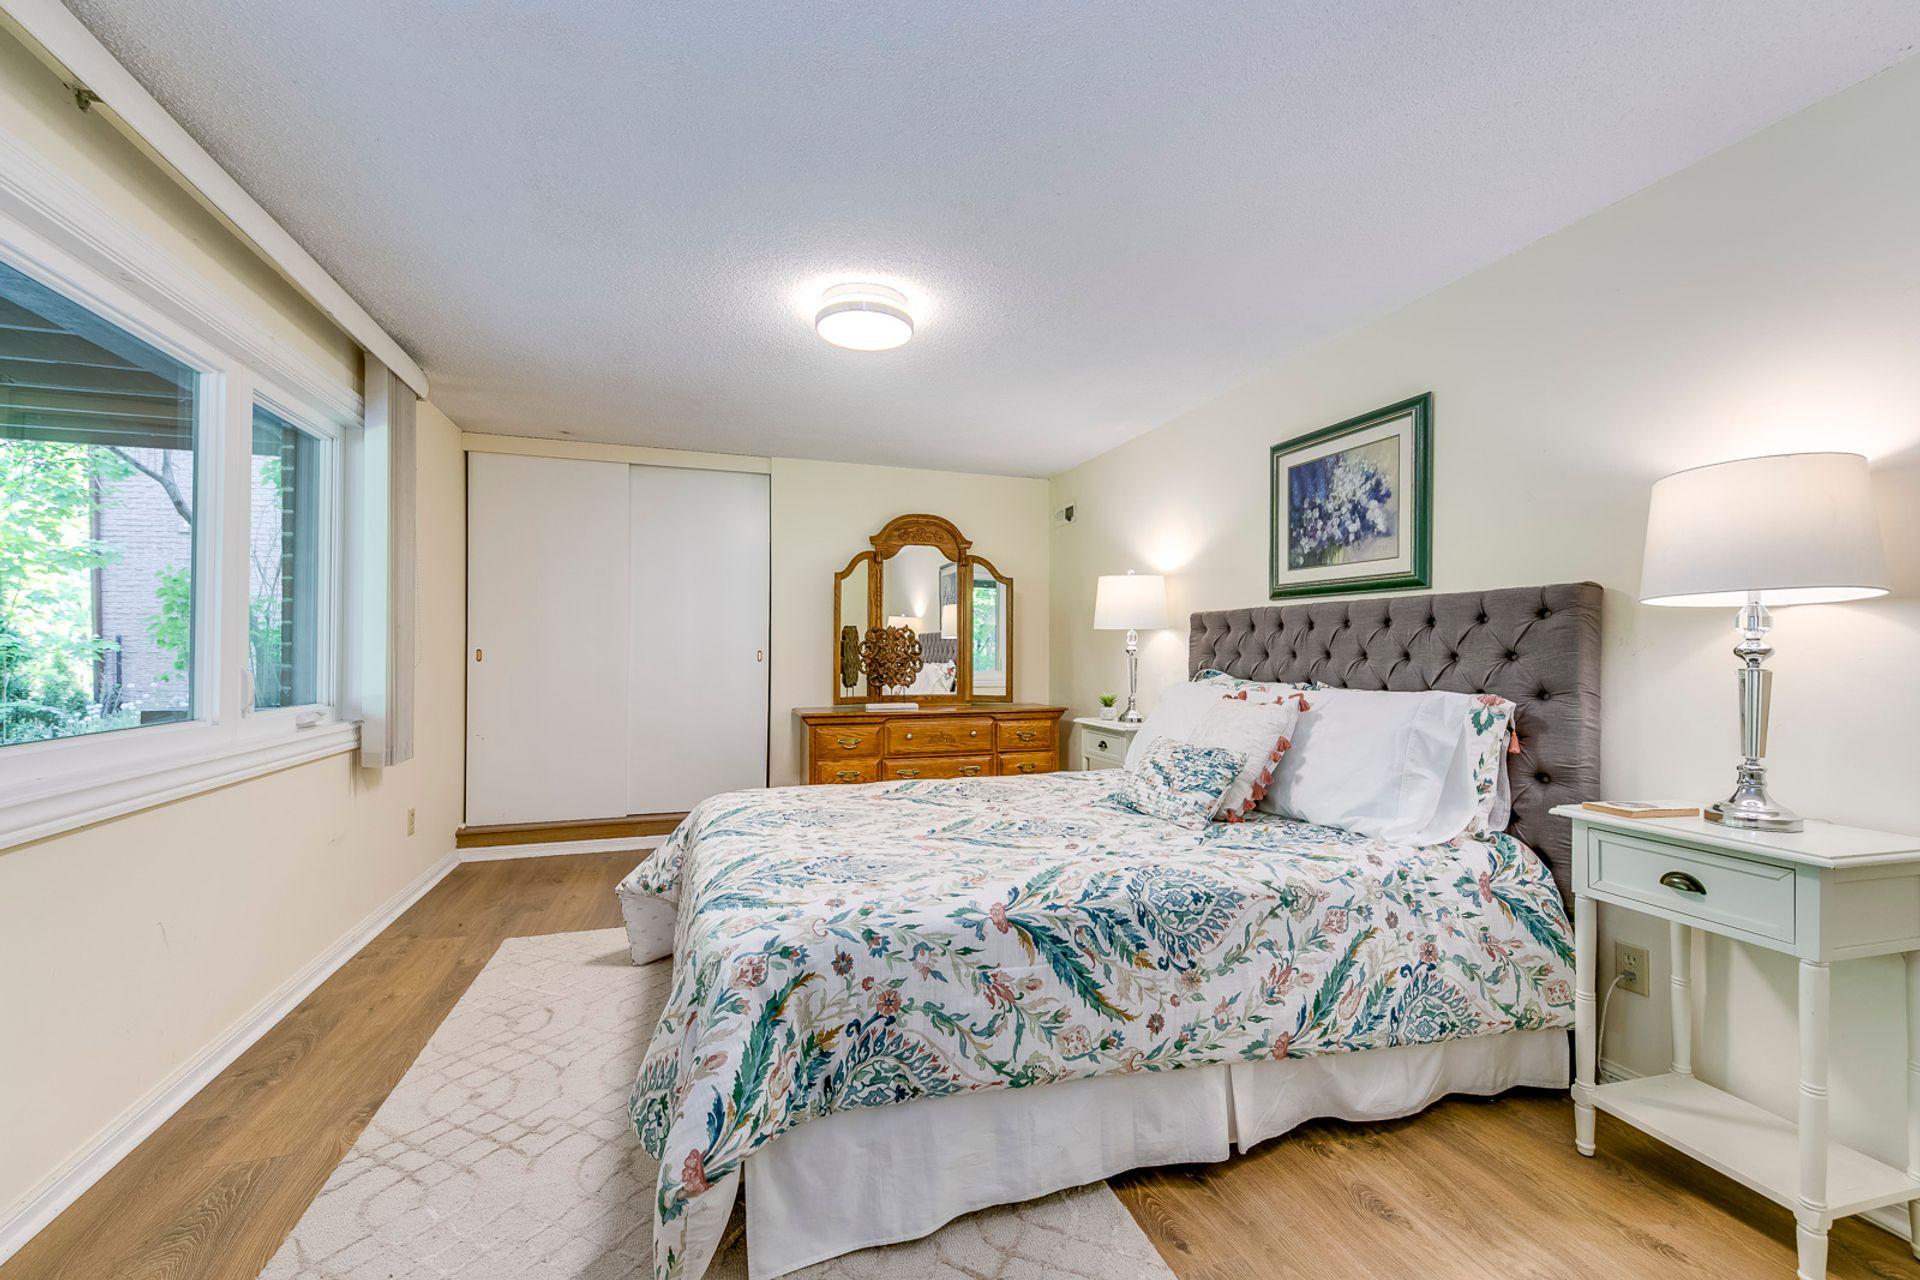 Guest Bedroom - 2421 Jarvis St, Mississauga - Elite3 & Team at 2421 Jarvis Street, Airport Corporate, Mississauga